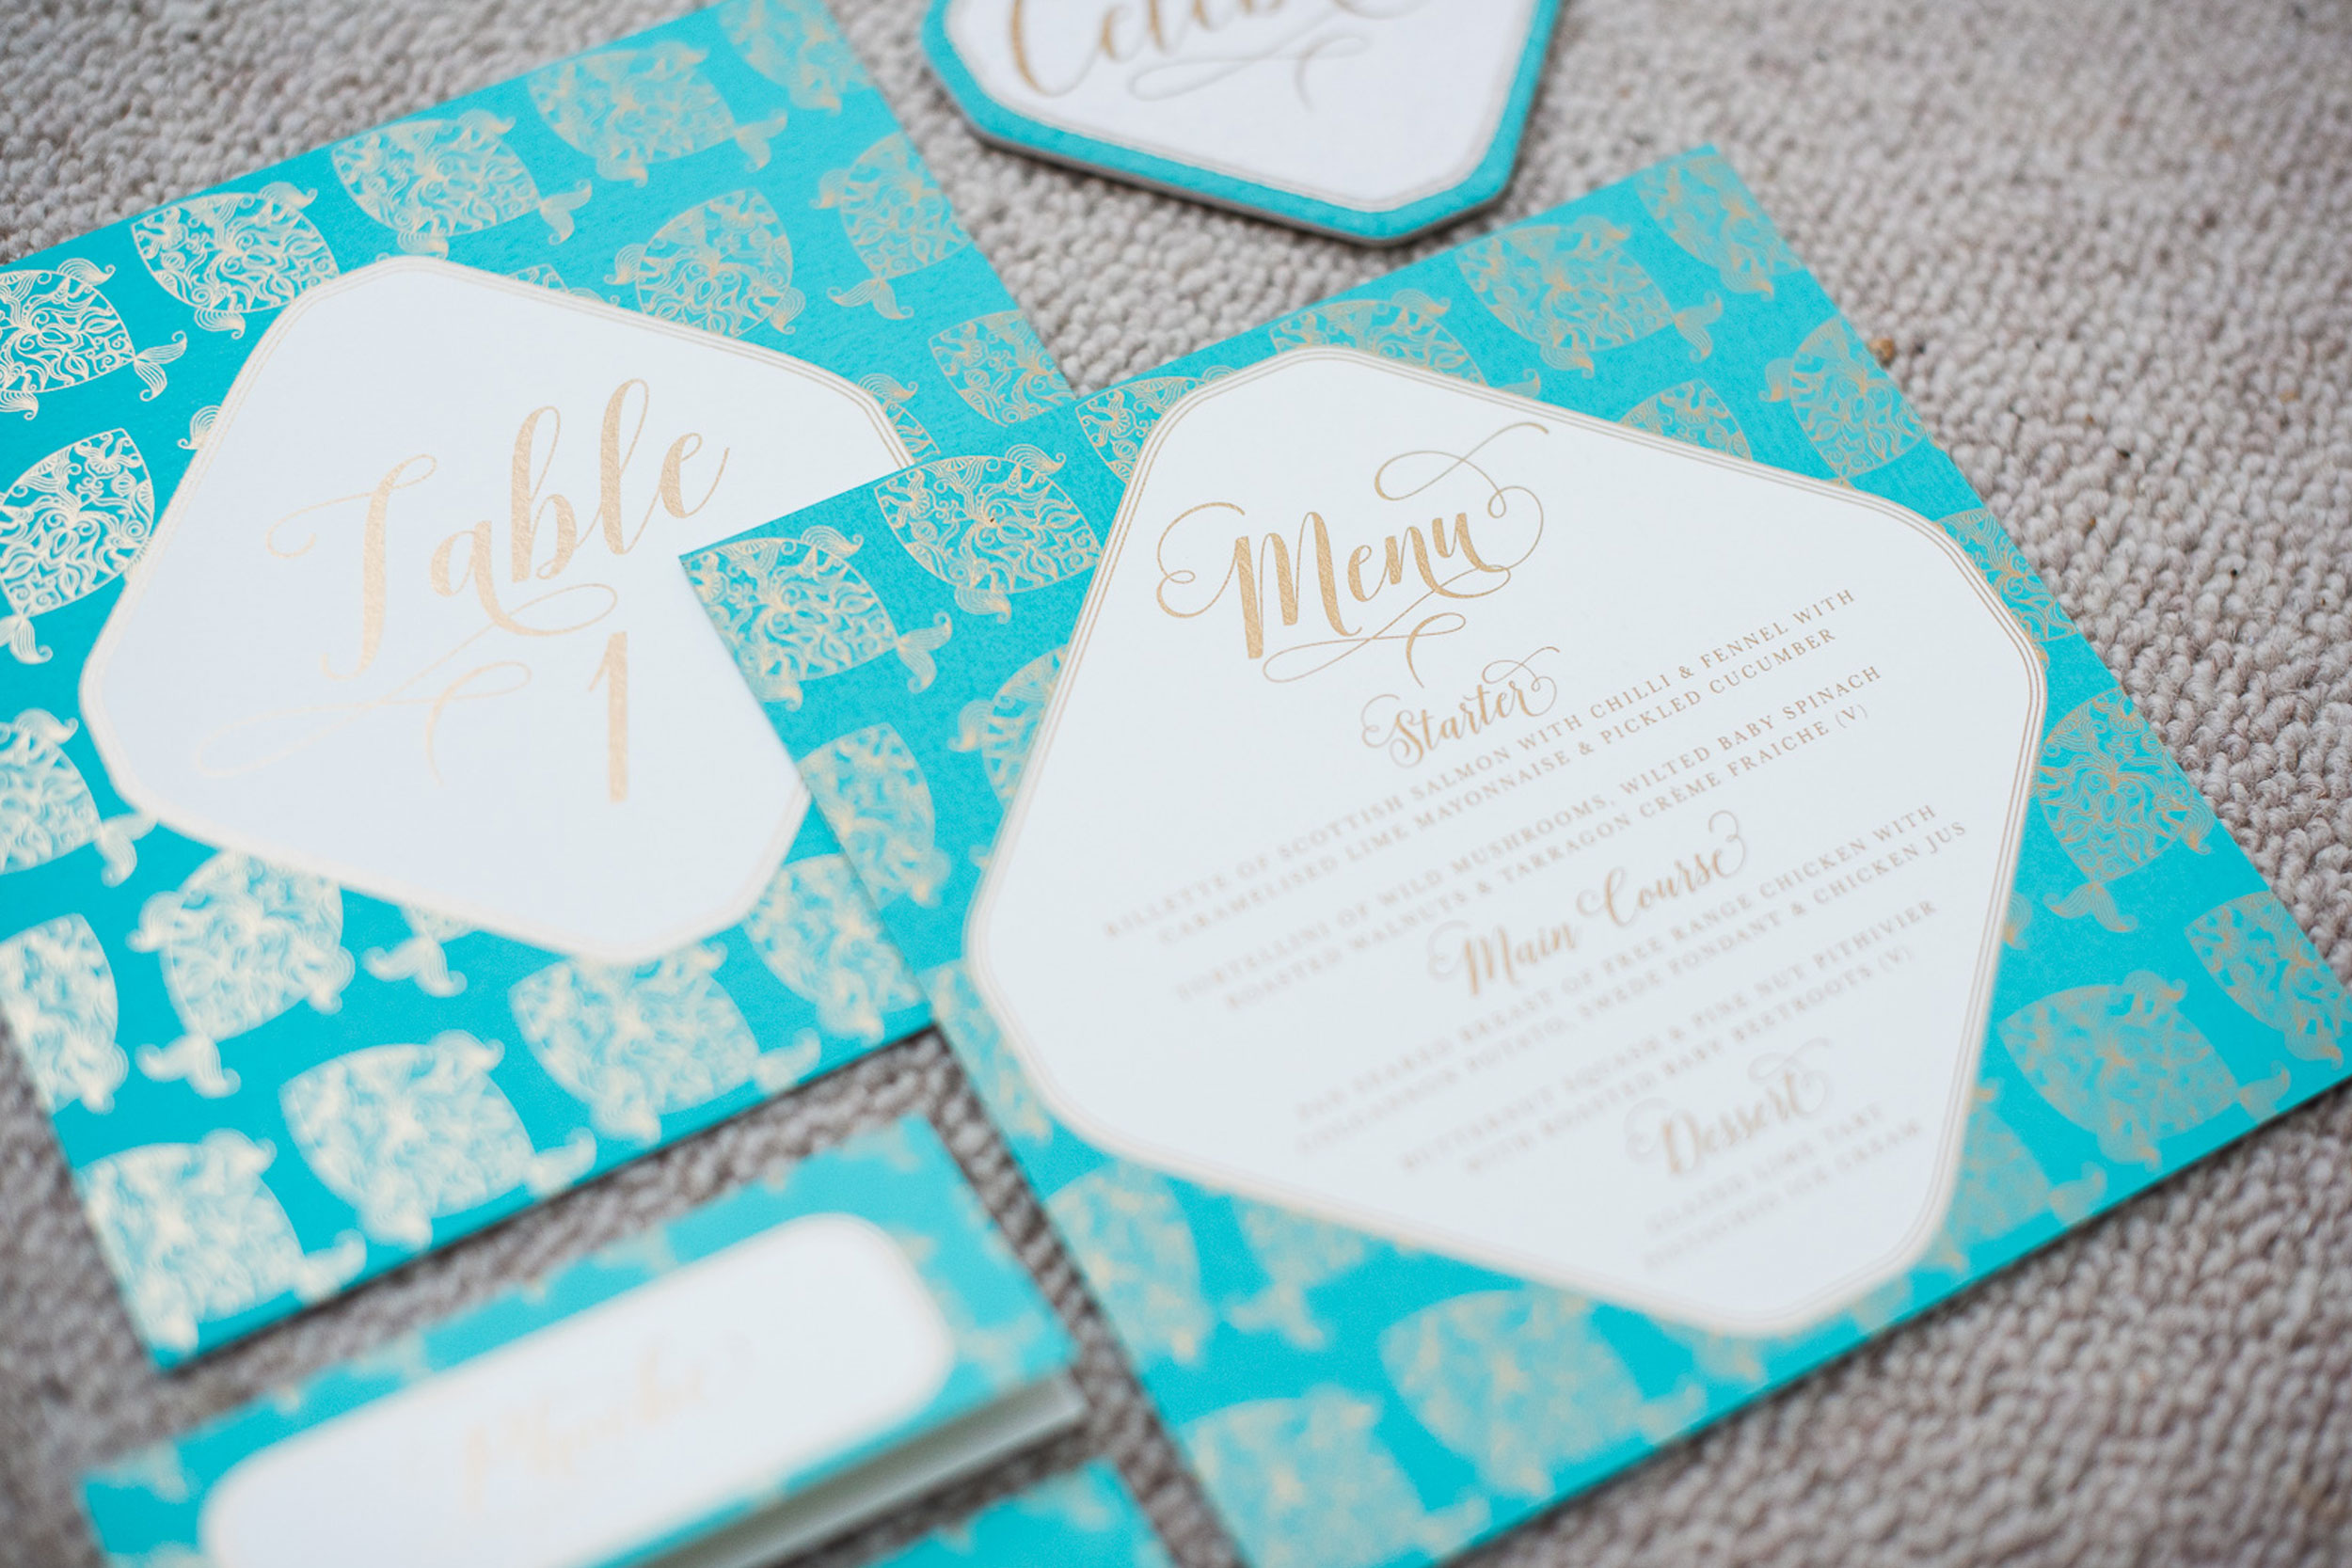 trio-of-life-fish-blue-menu-table-number-wedding-invitation.jpg